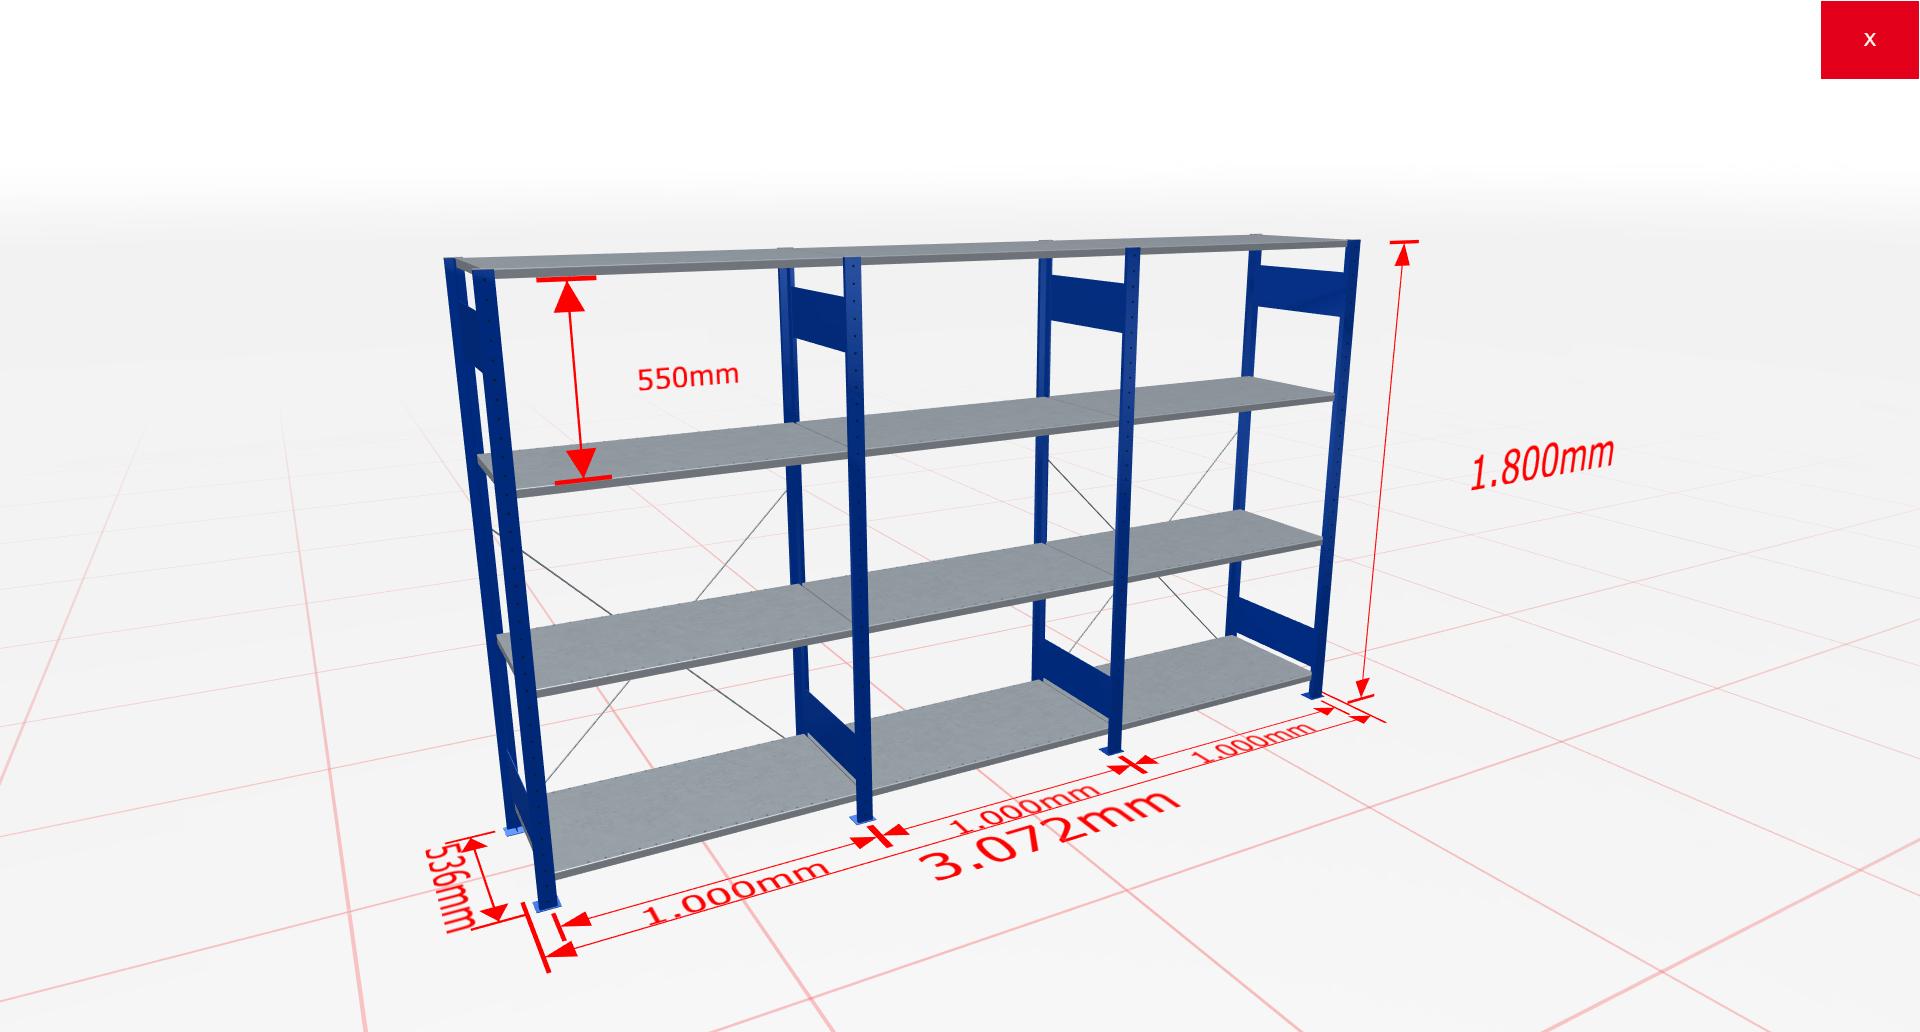 Fachbodenregal Komplettregal 1800x3072x500 mm (HxBxT) SCHULTE Lagertechnik blau 4 Ebenen  150 kg je Boden